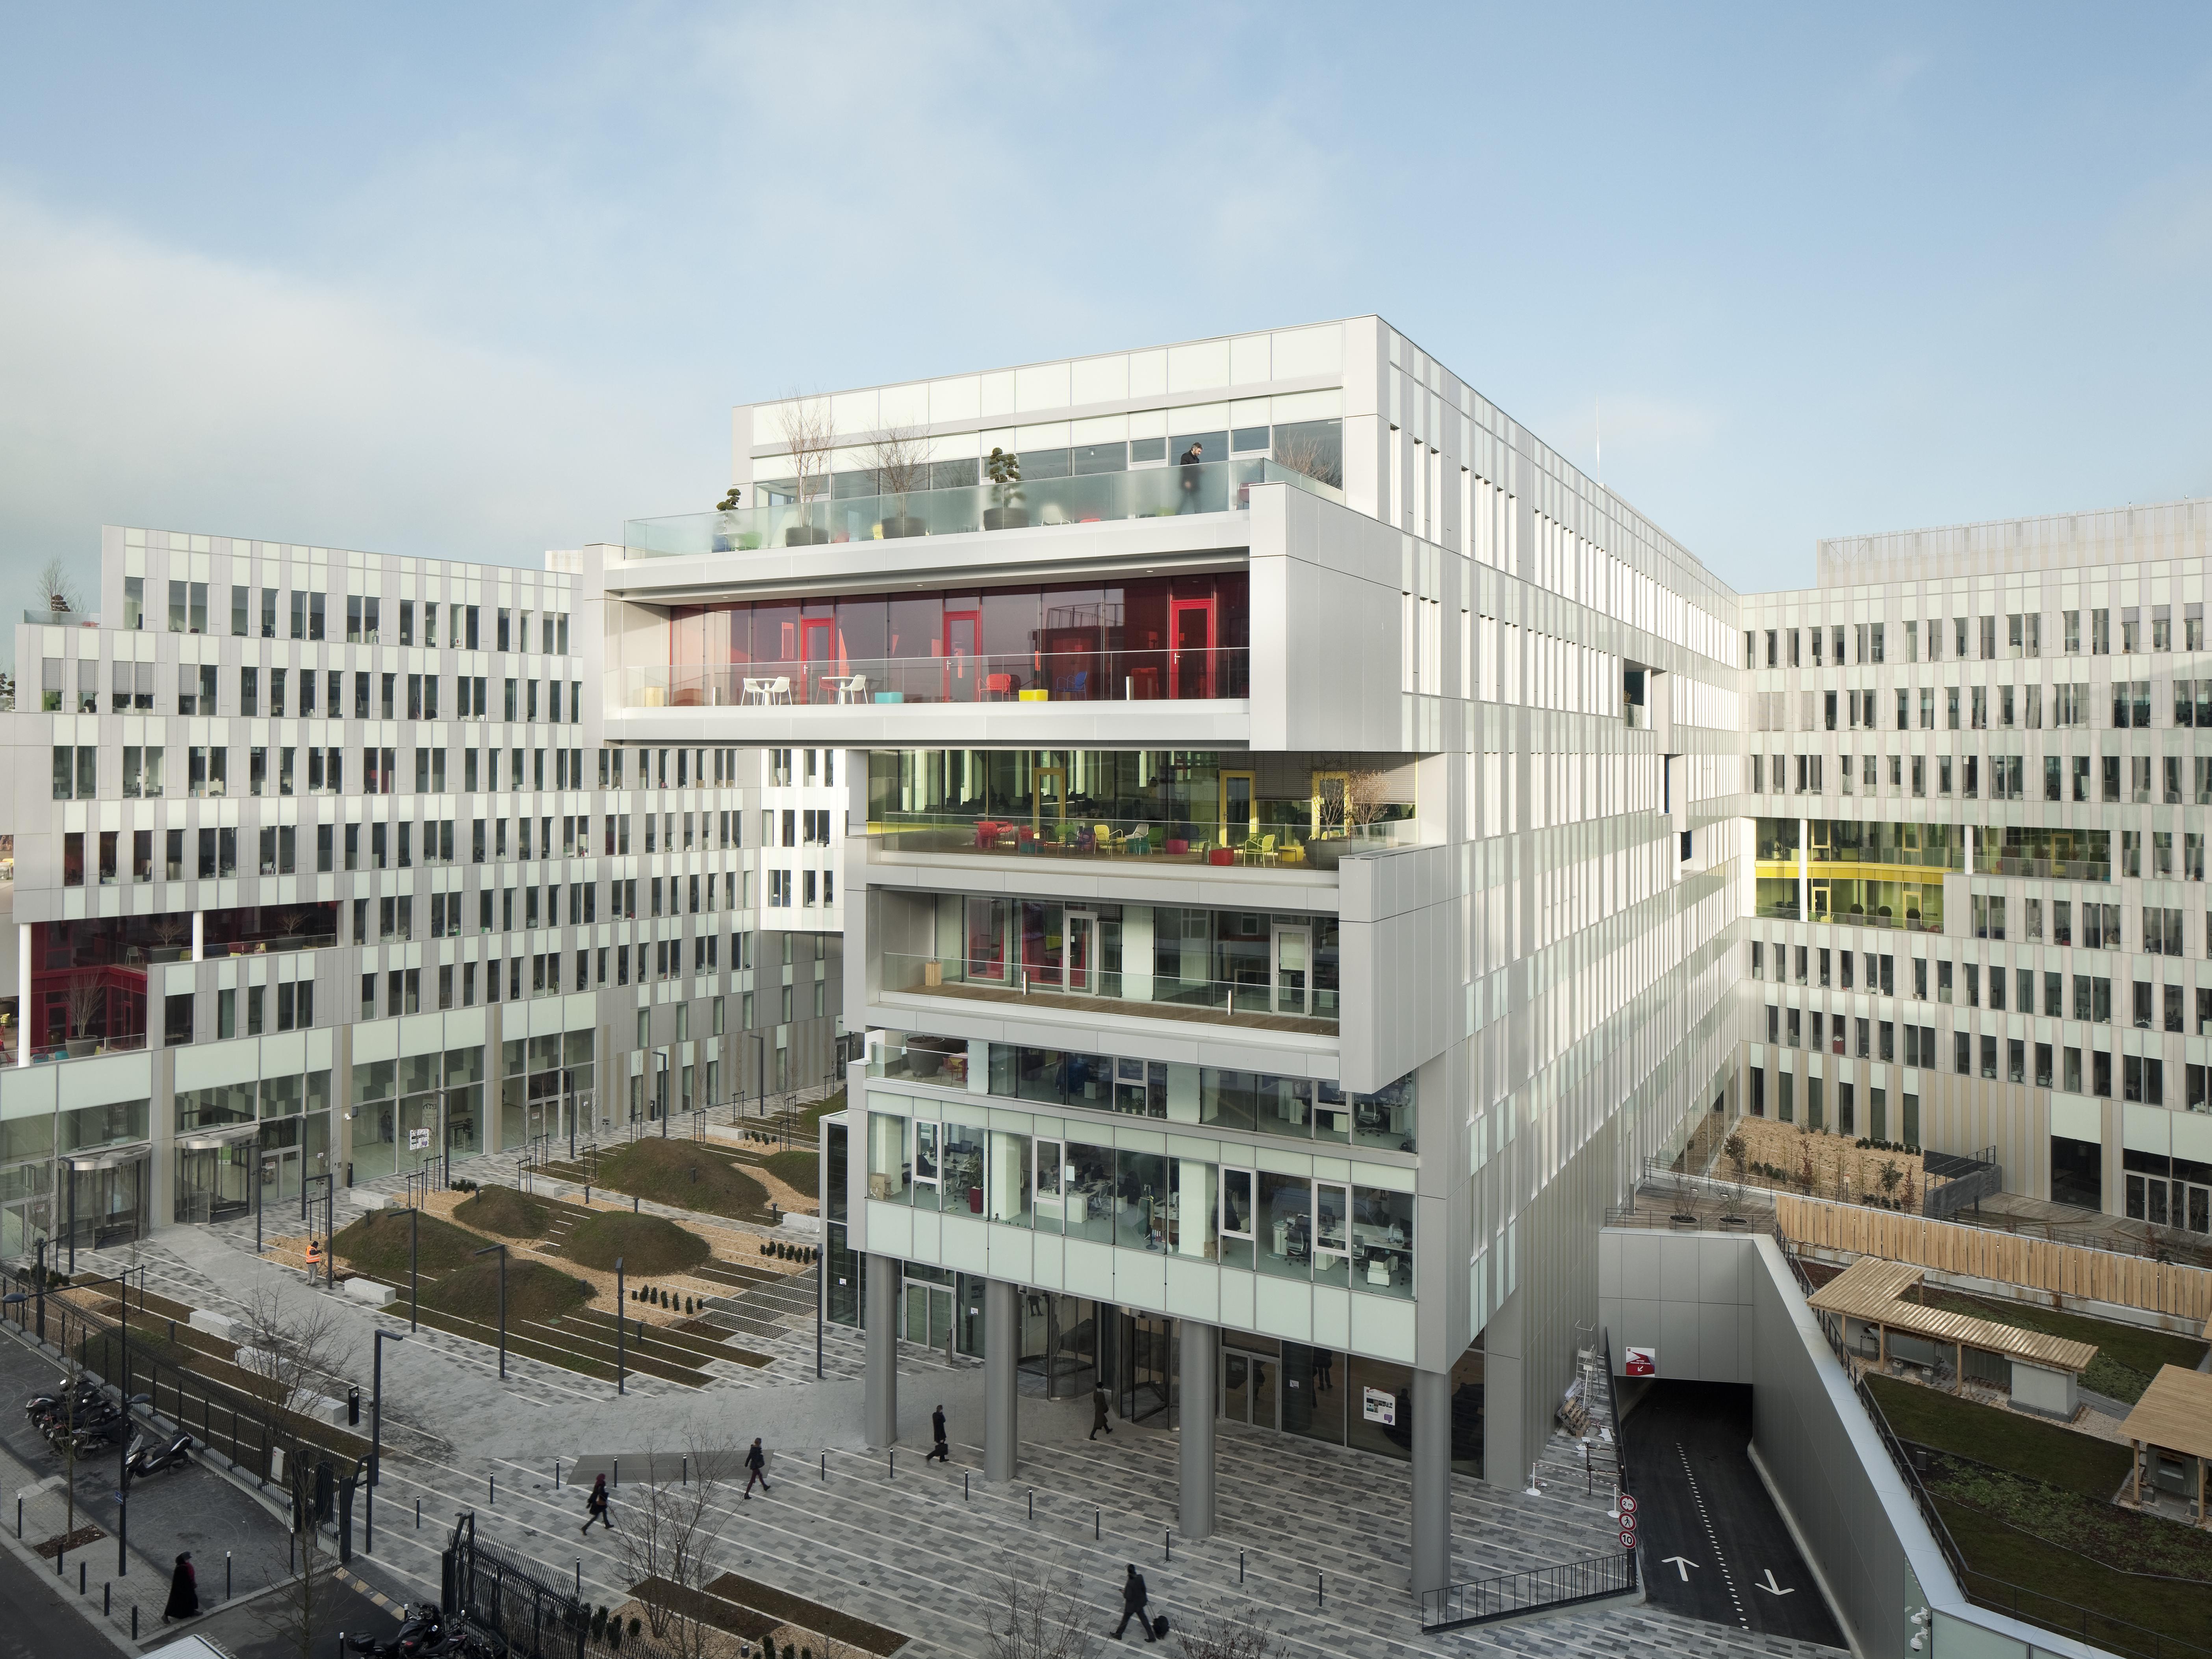 christian-pohl-campus-sfr02-paris-individualfassade-duranizenatural-duranizecham-1